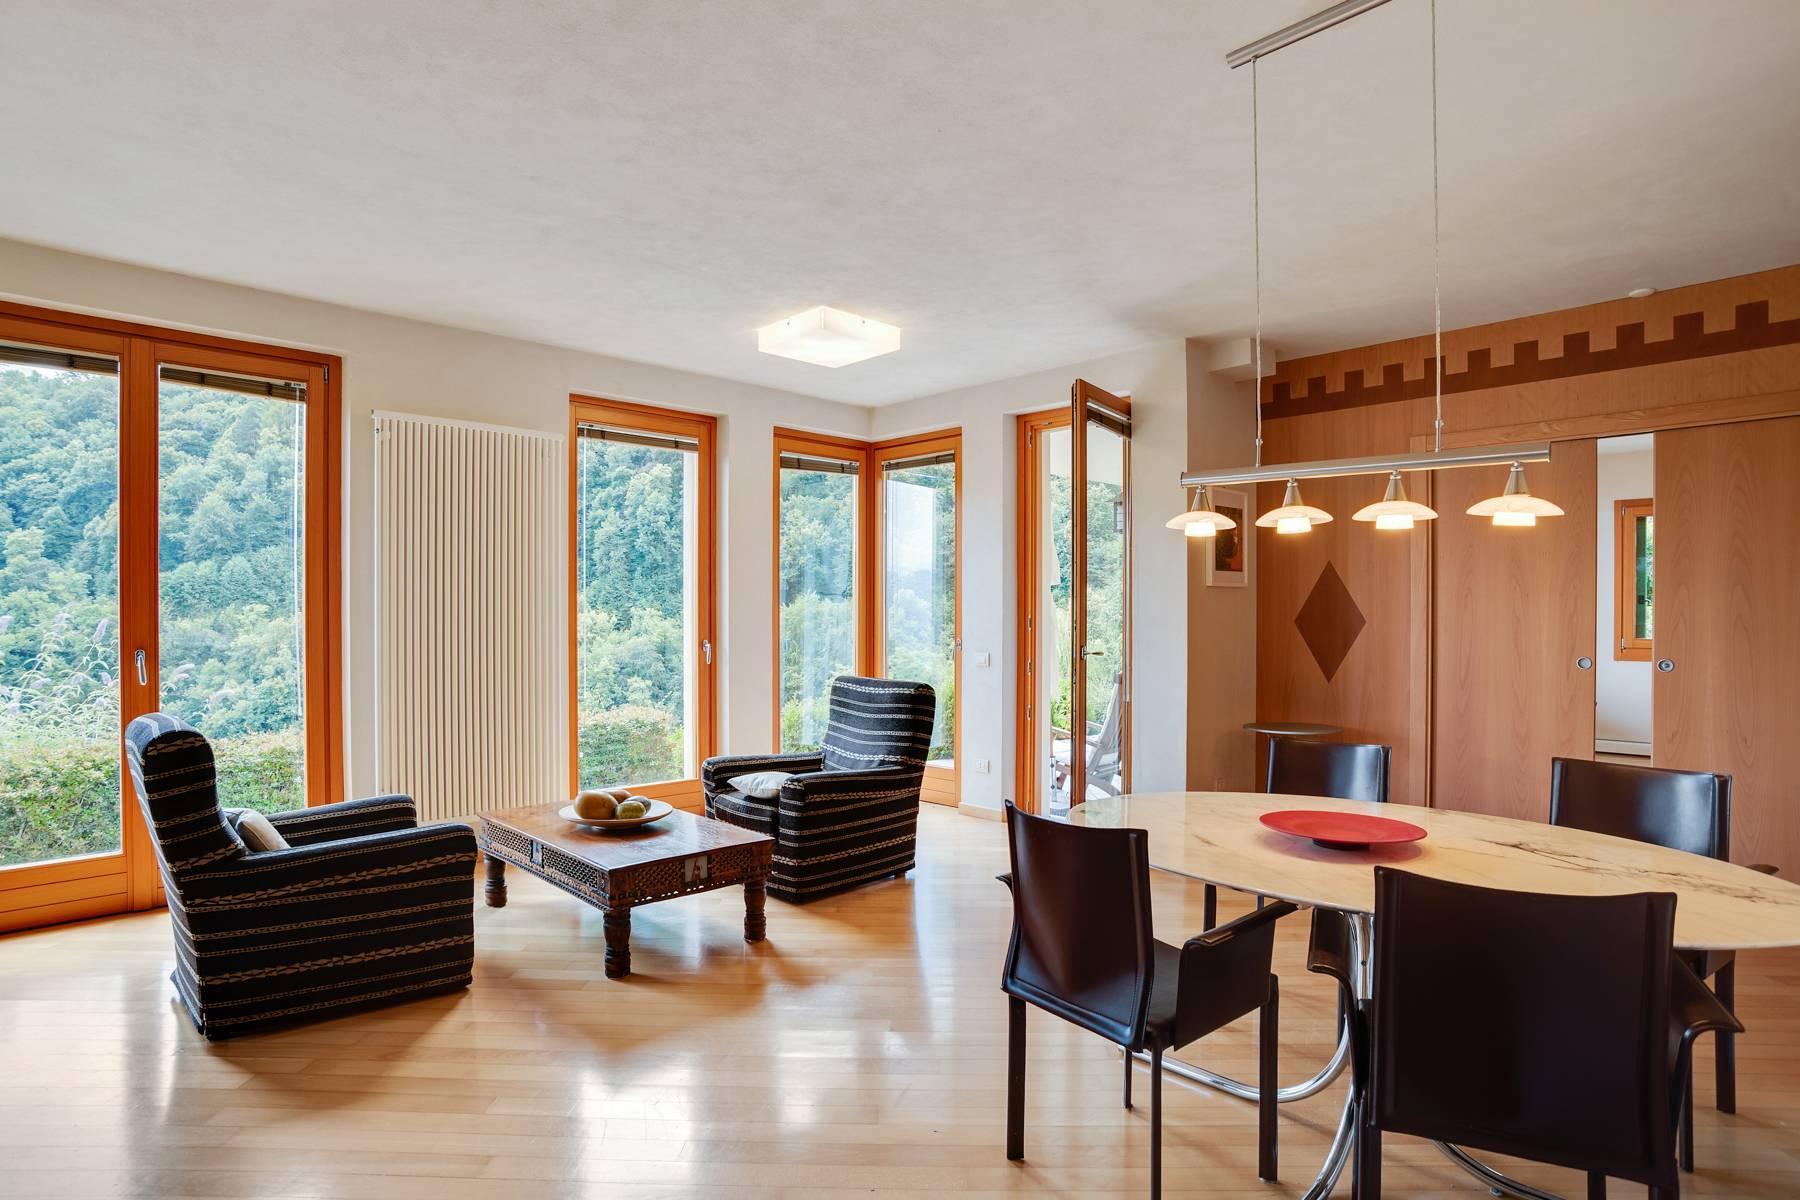 Splendida villa moderna sulla collina soleggiata sopra Argegno - 35